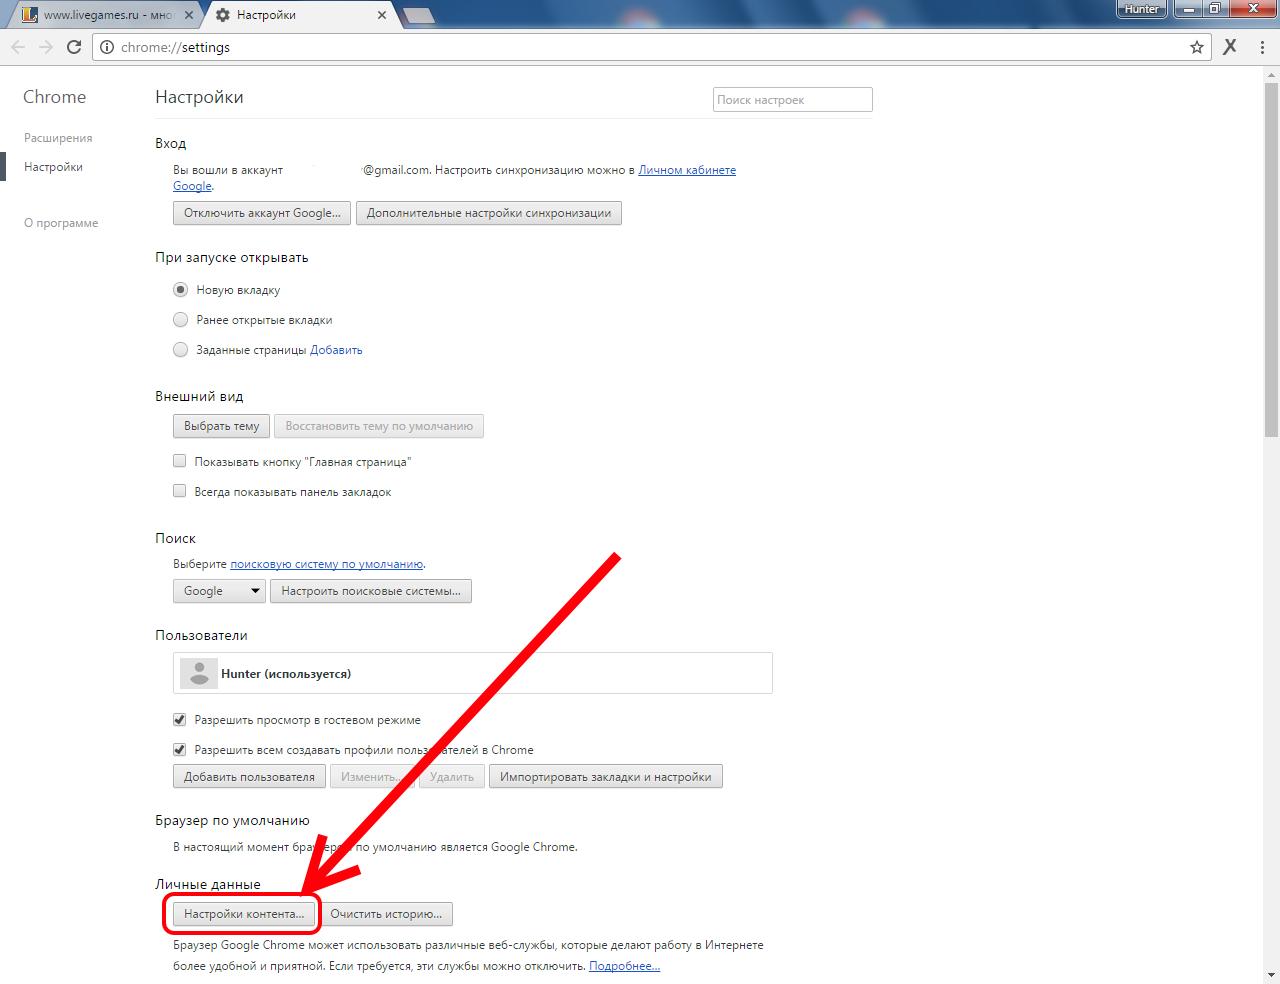 Как назначить Chrome браузером по умолчанию - Android. - Google Chrome 75